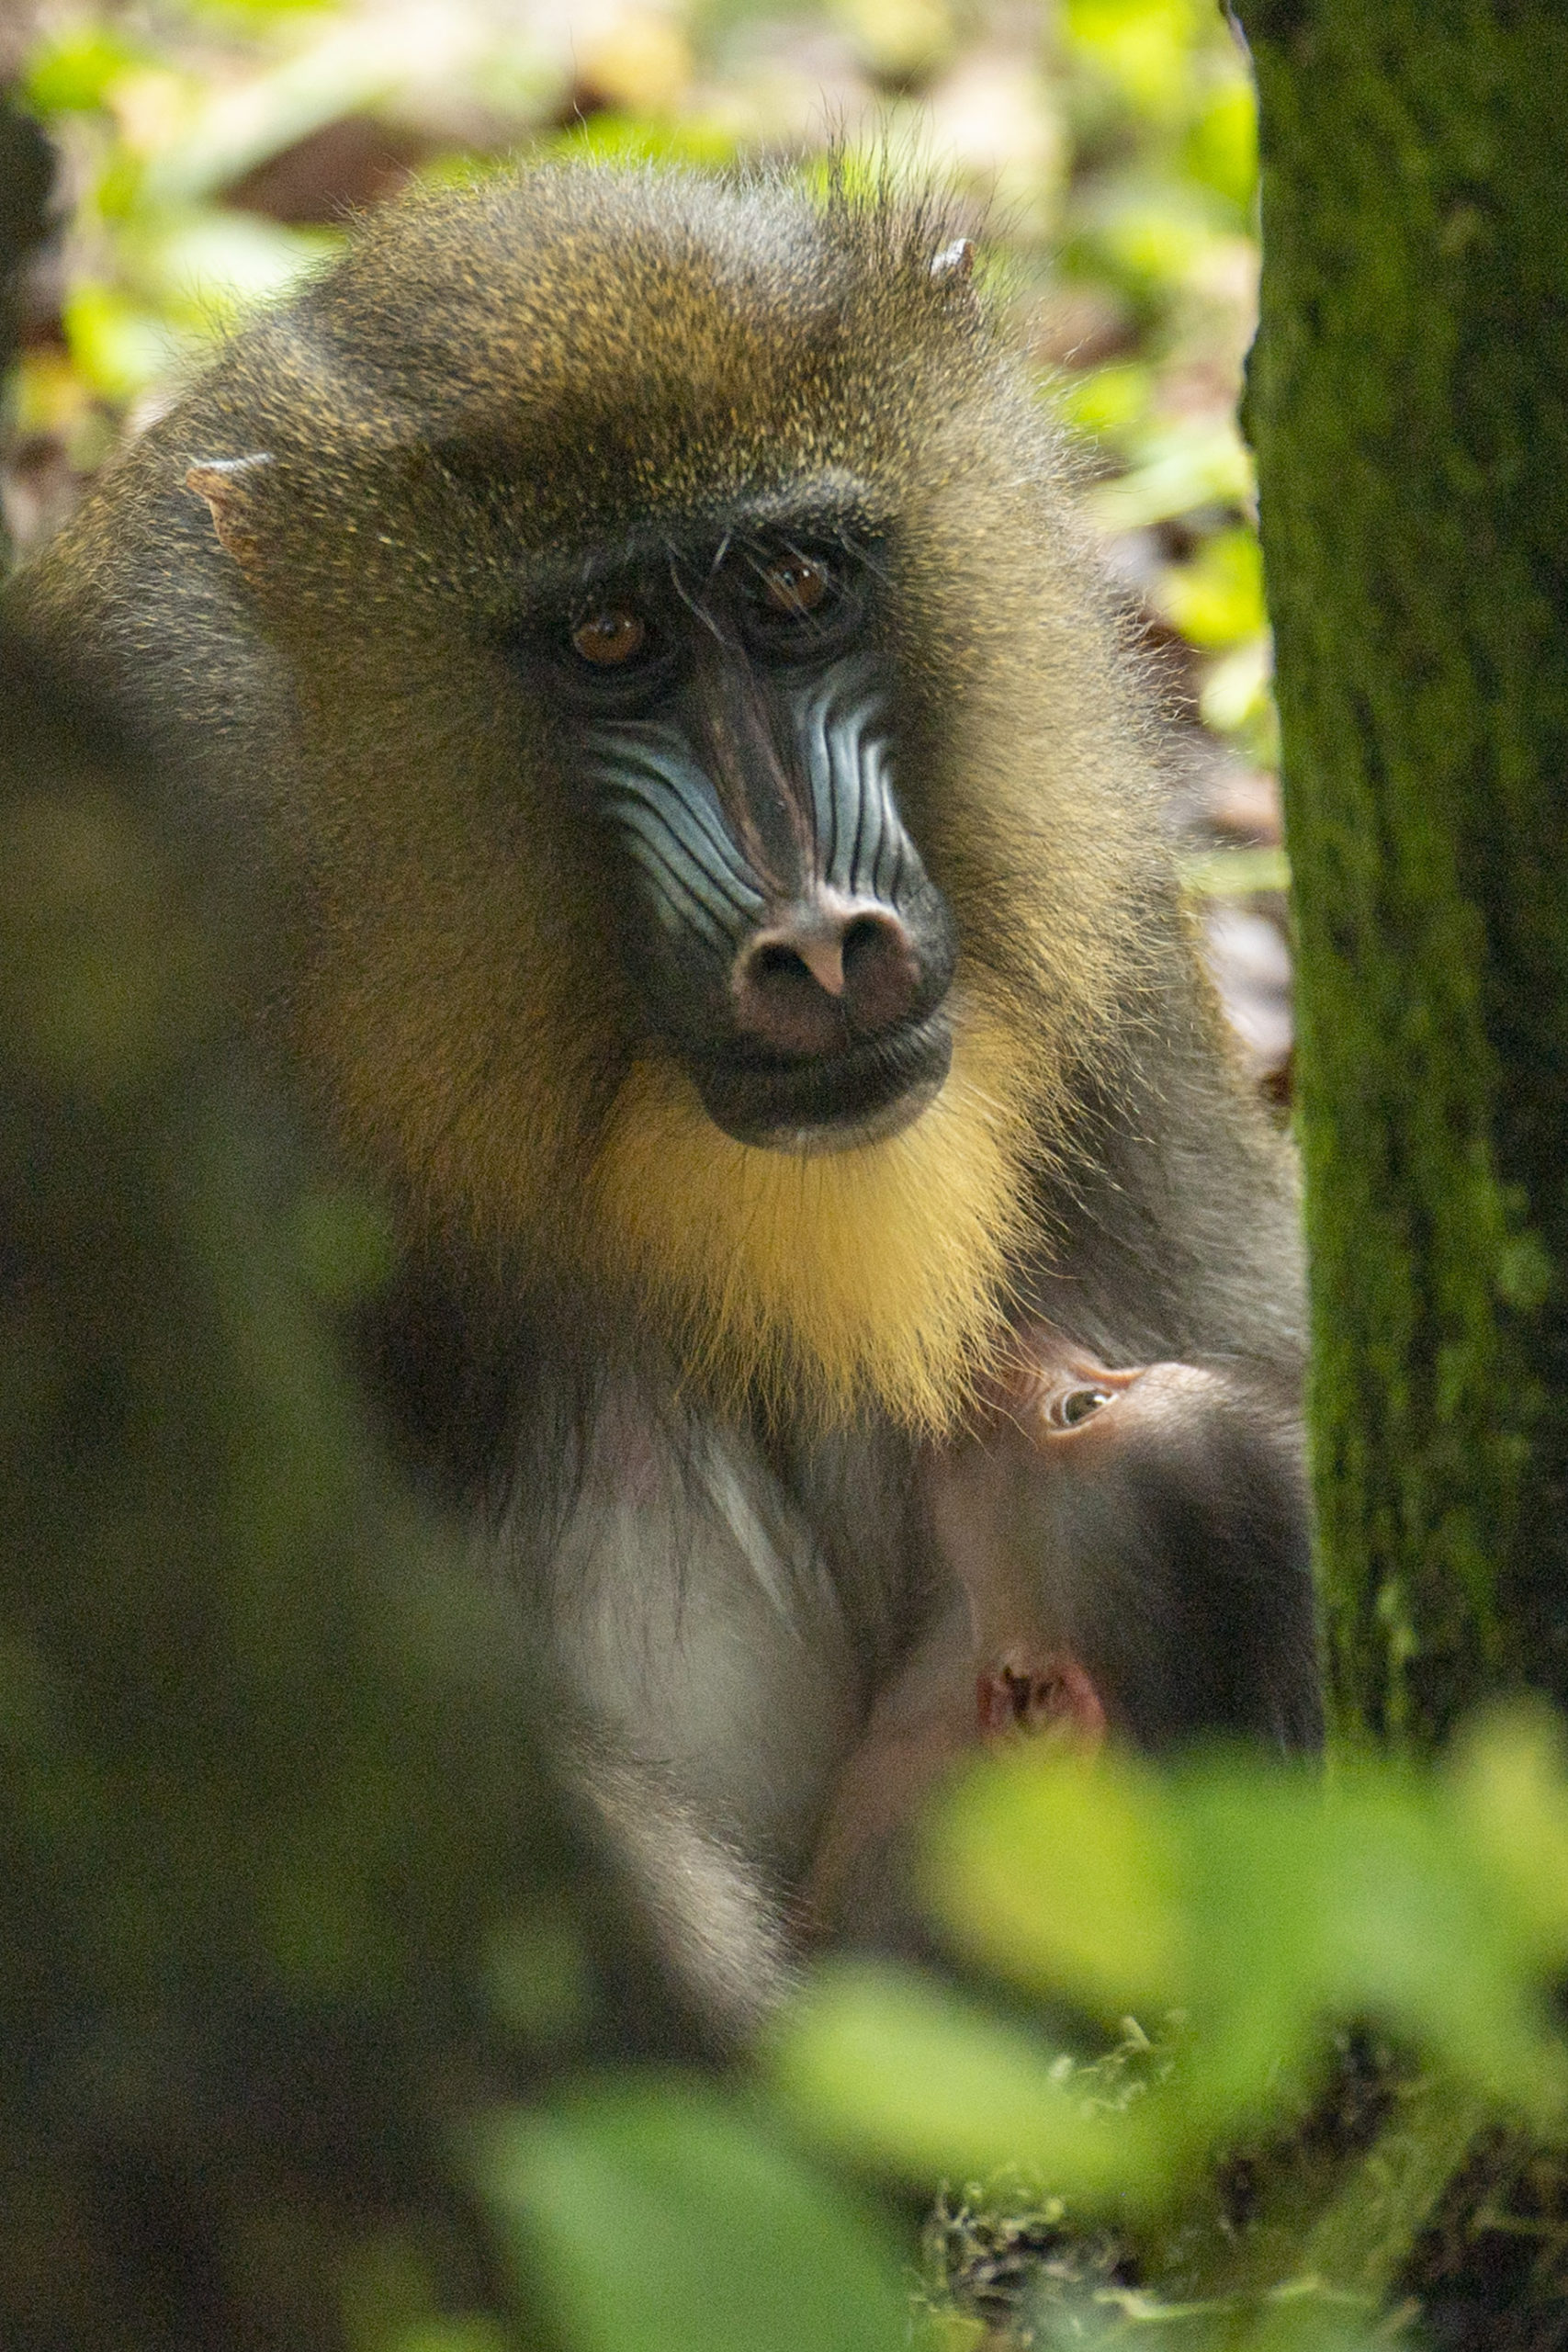 Baby Mandrill born at Disney's Animal Kingdom - April 2021